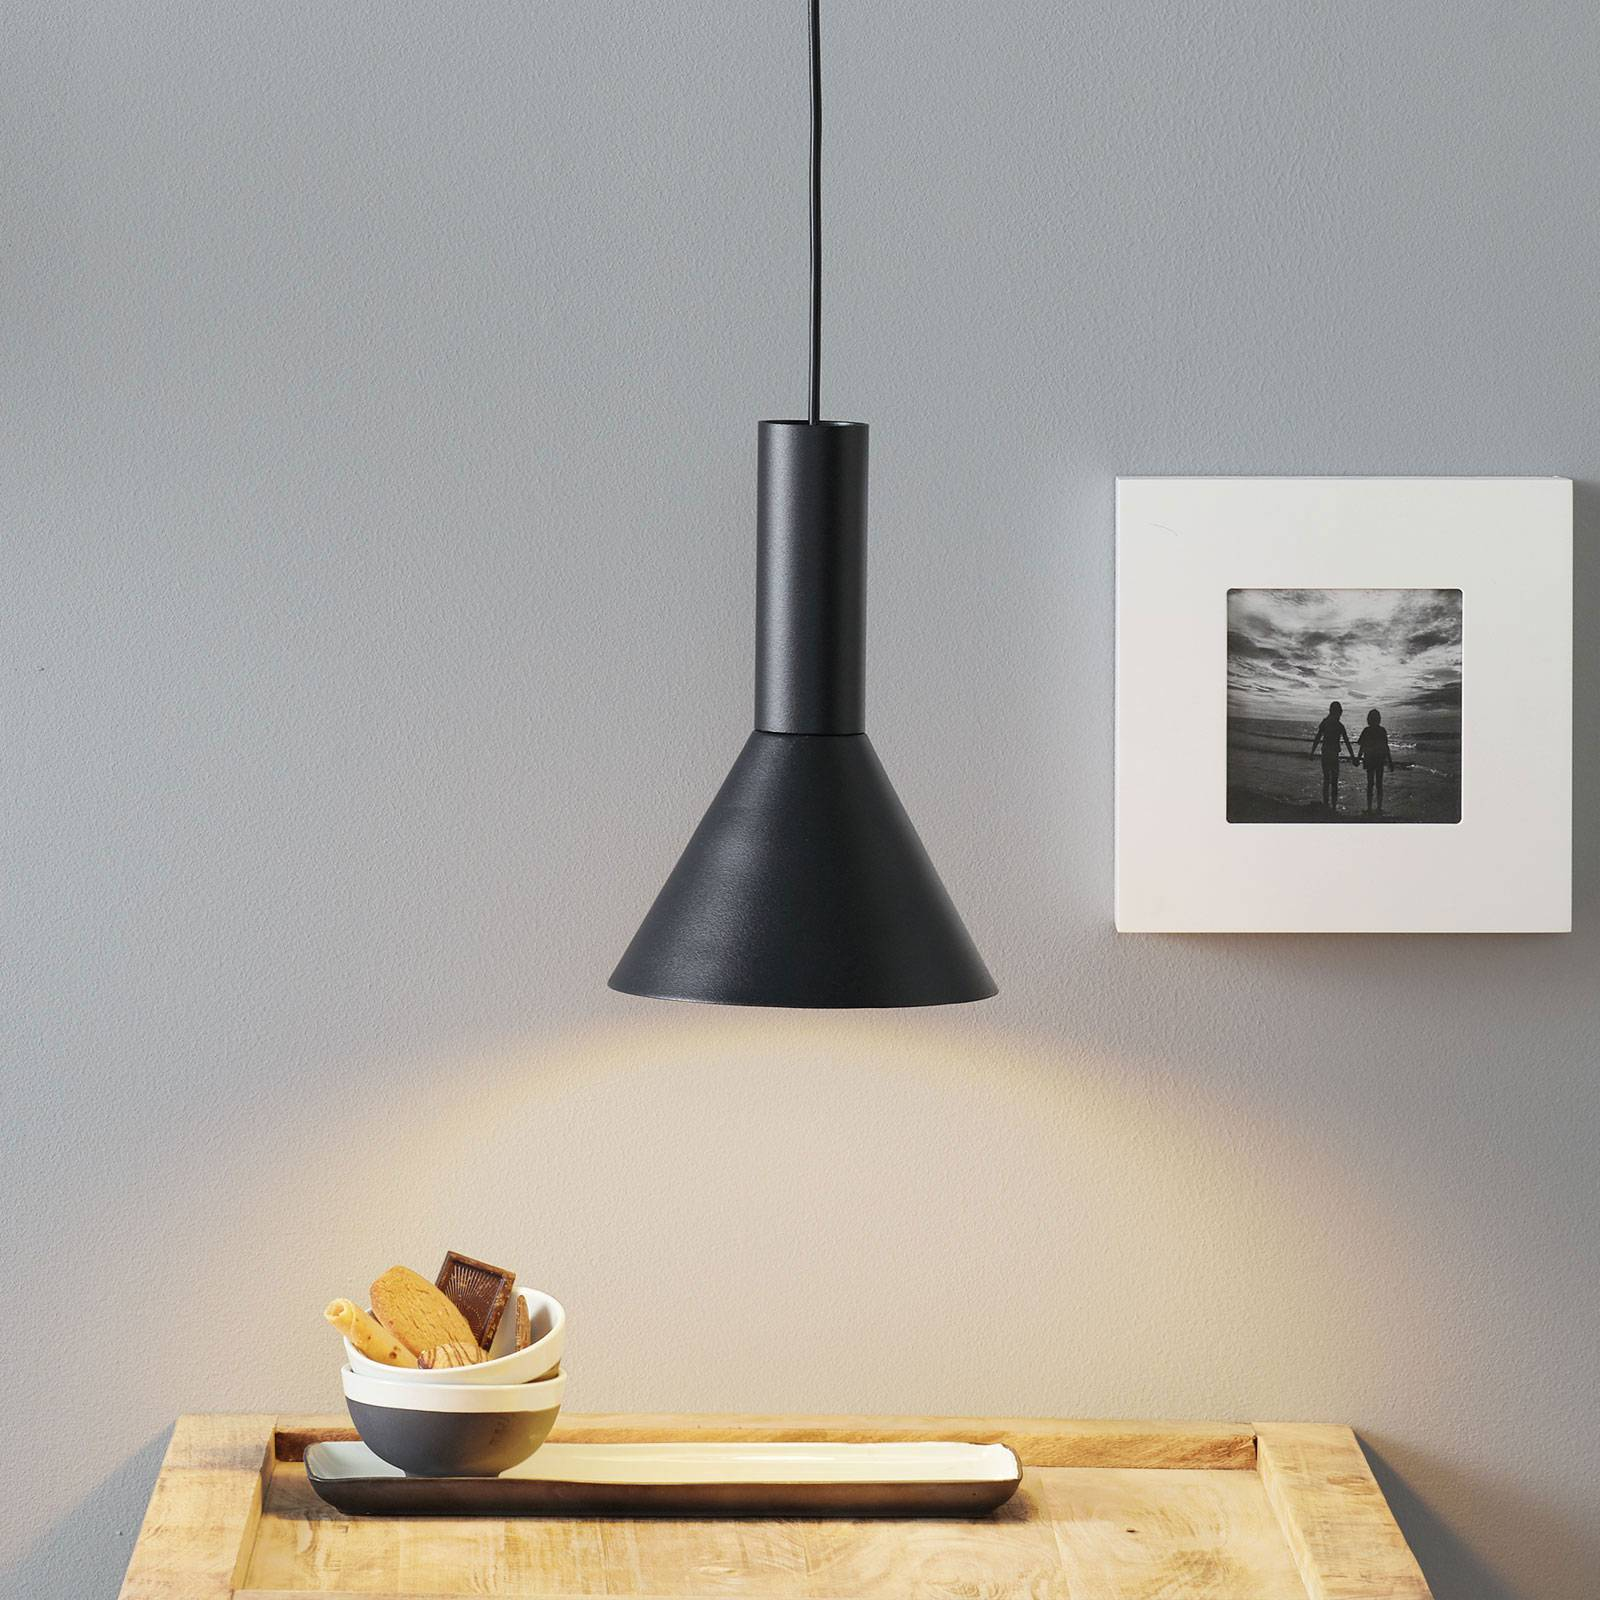 Lucande Caris -riippuvalo Ø 19 cm musta/valkoinen